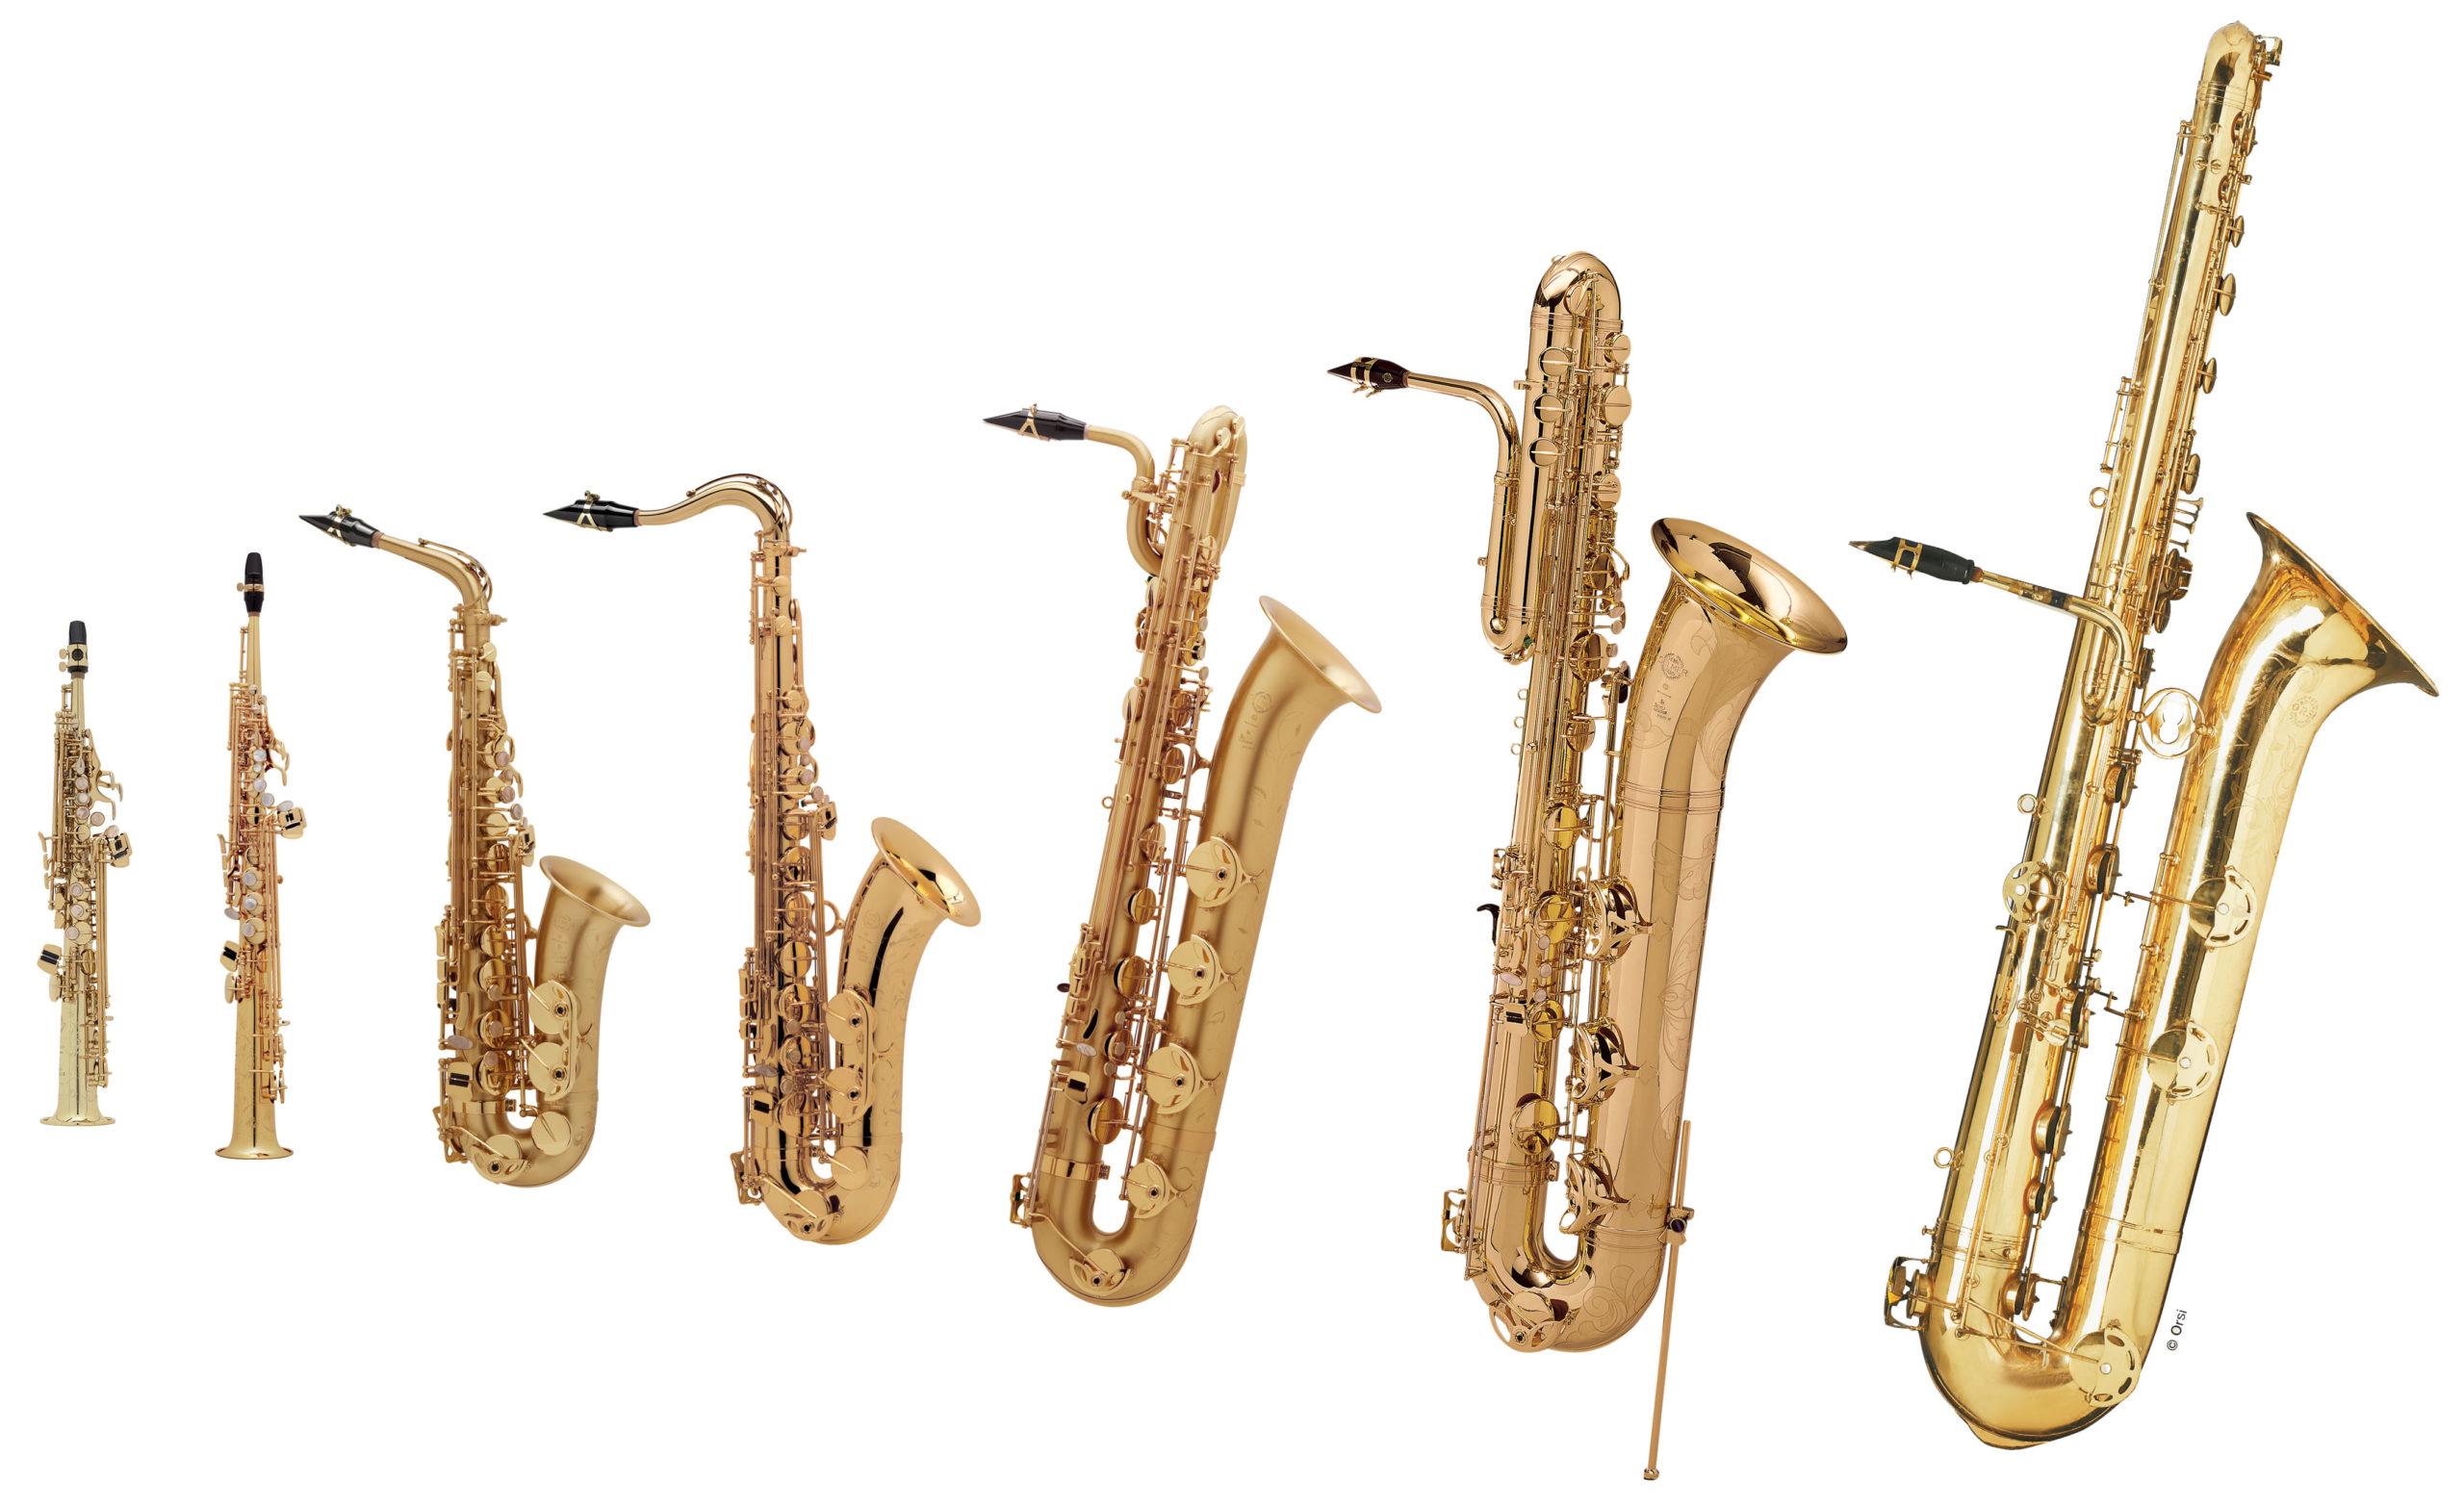 Left-to-right the sopranino, the soprano, the alto, the tenor, the baritone, the bass, and the double bass saxophones